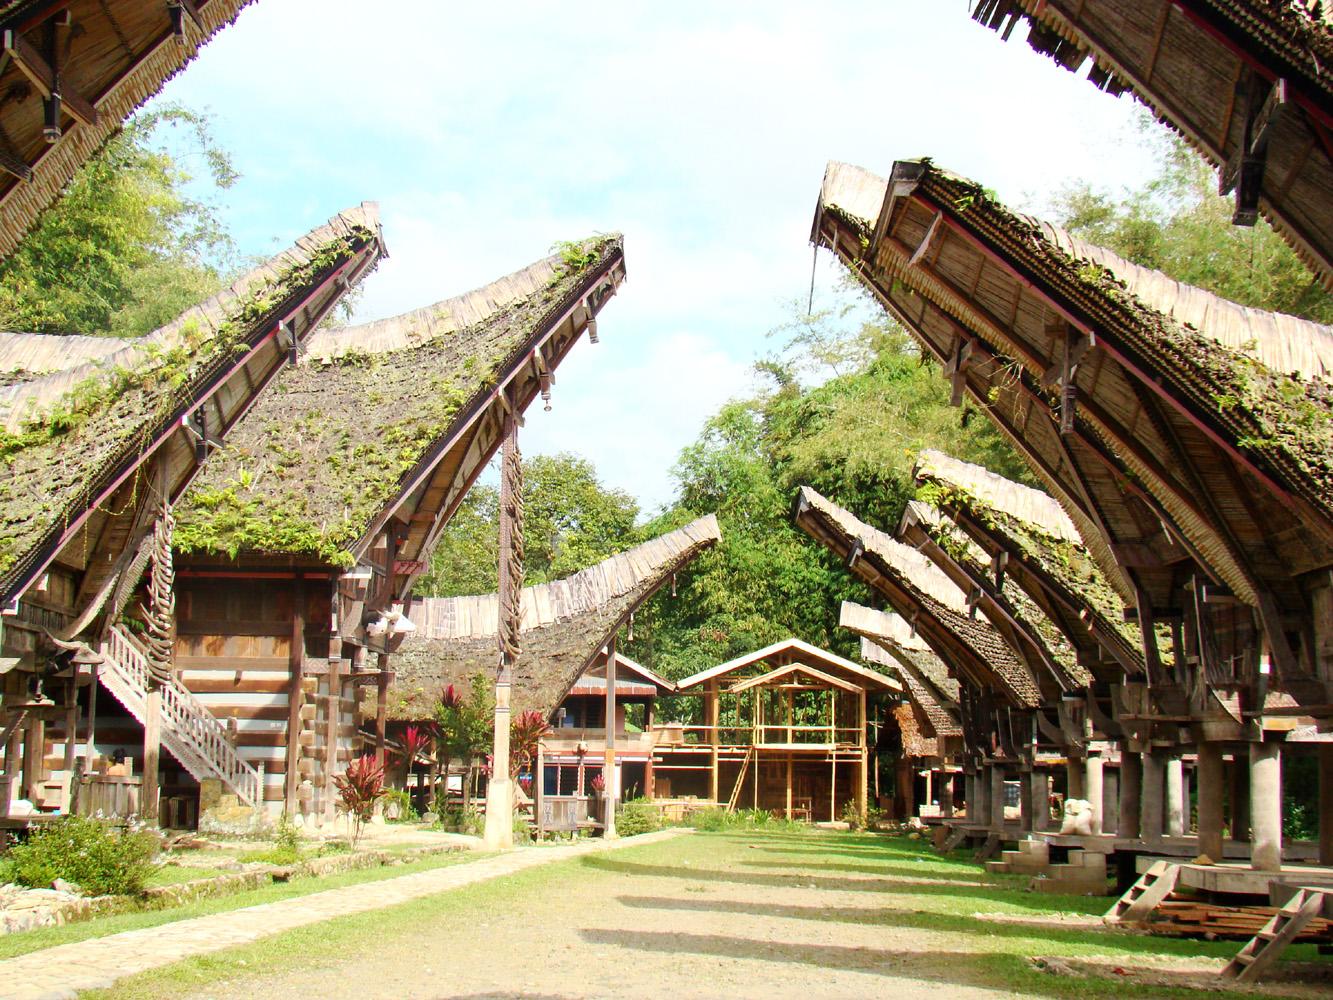 Tana Toraja Indonesia  city images : tana toraja exotic blend of nature and culture is unique tana toraja ...